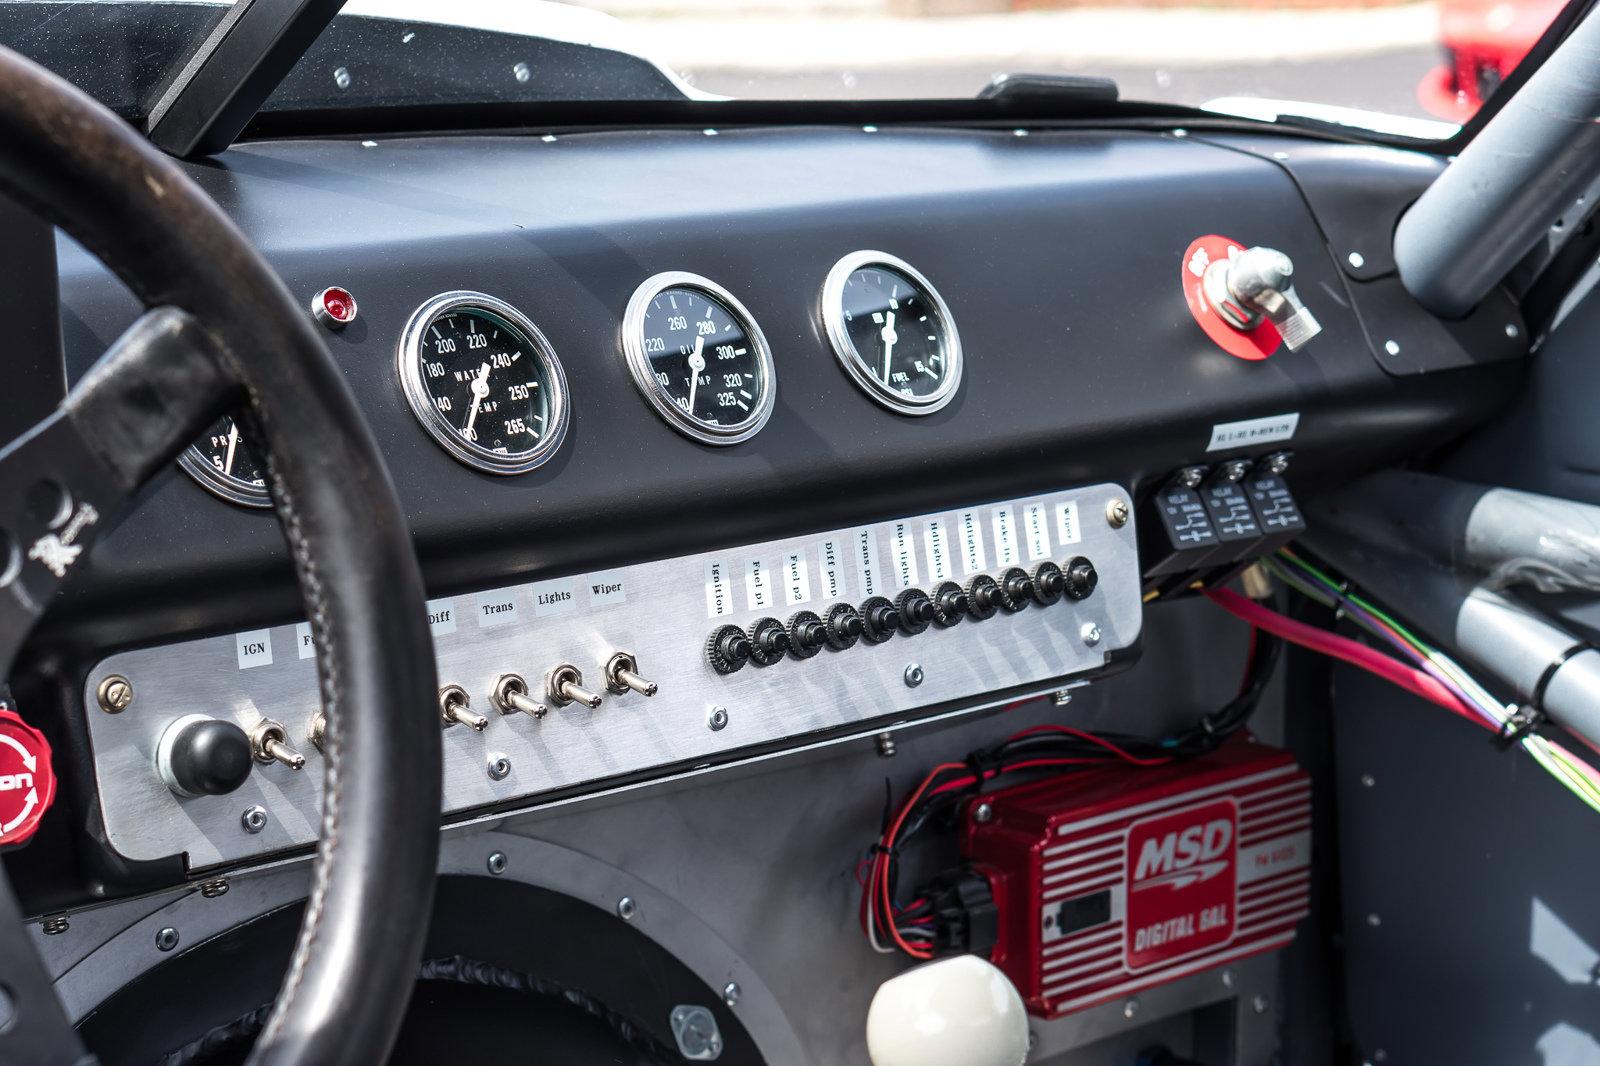 Pre-Owned 1976 Chevrolet Corvette Greenwood Widebody